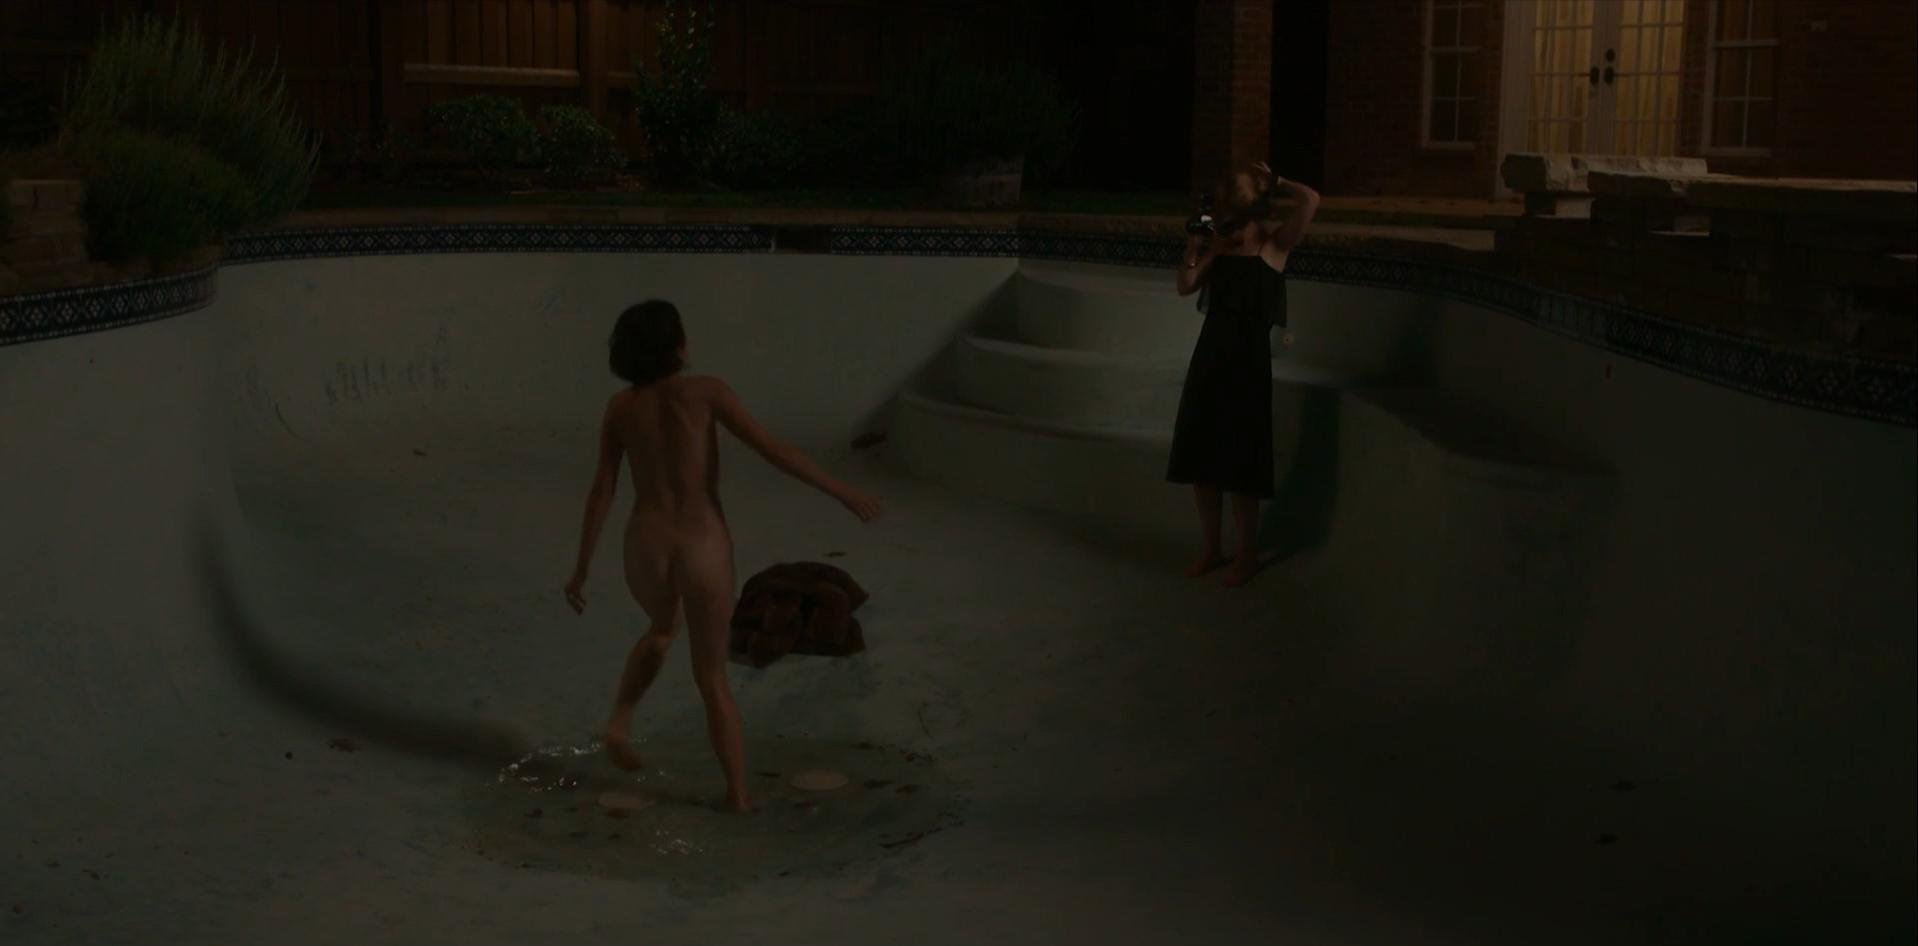 Susan May Pratt nude - The Mink Catcher (2015)